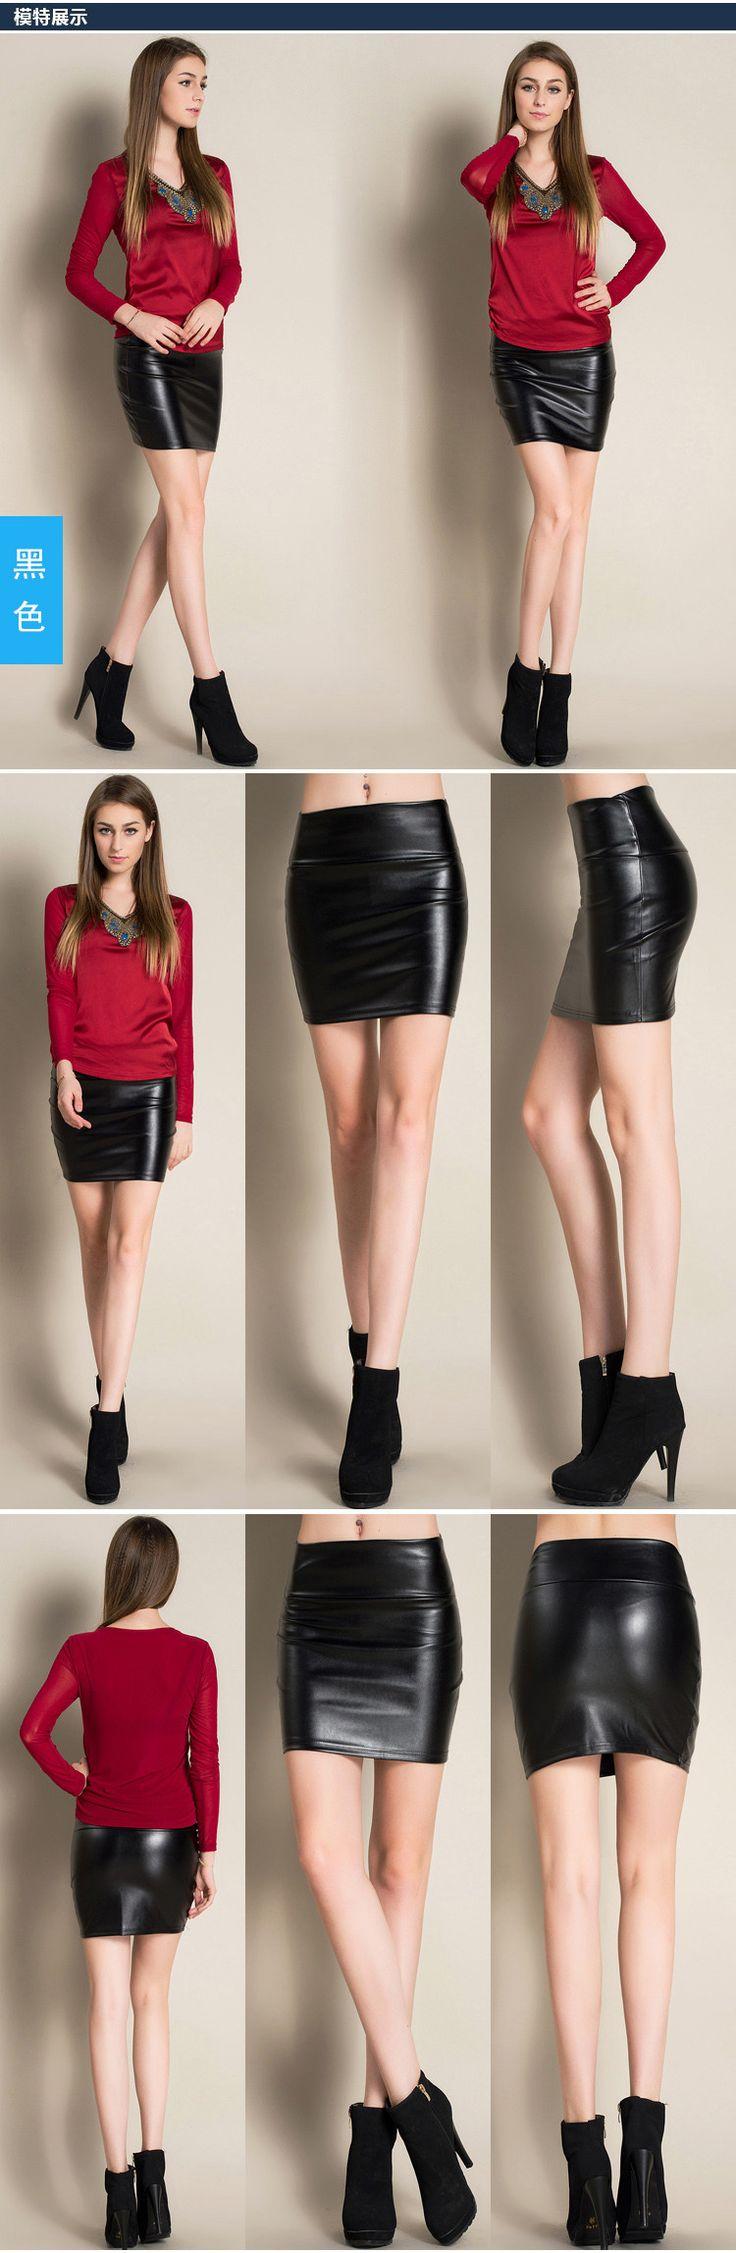 2017 New fashion Women faux pu Leather skirt high waist party clothing female short pencil woman skirts saias femininas - free shipping worldwide